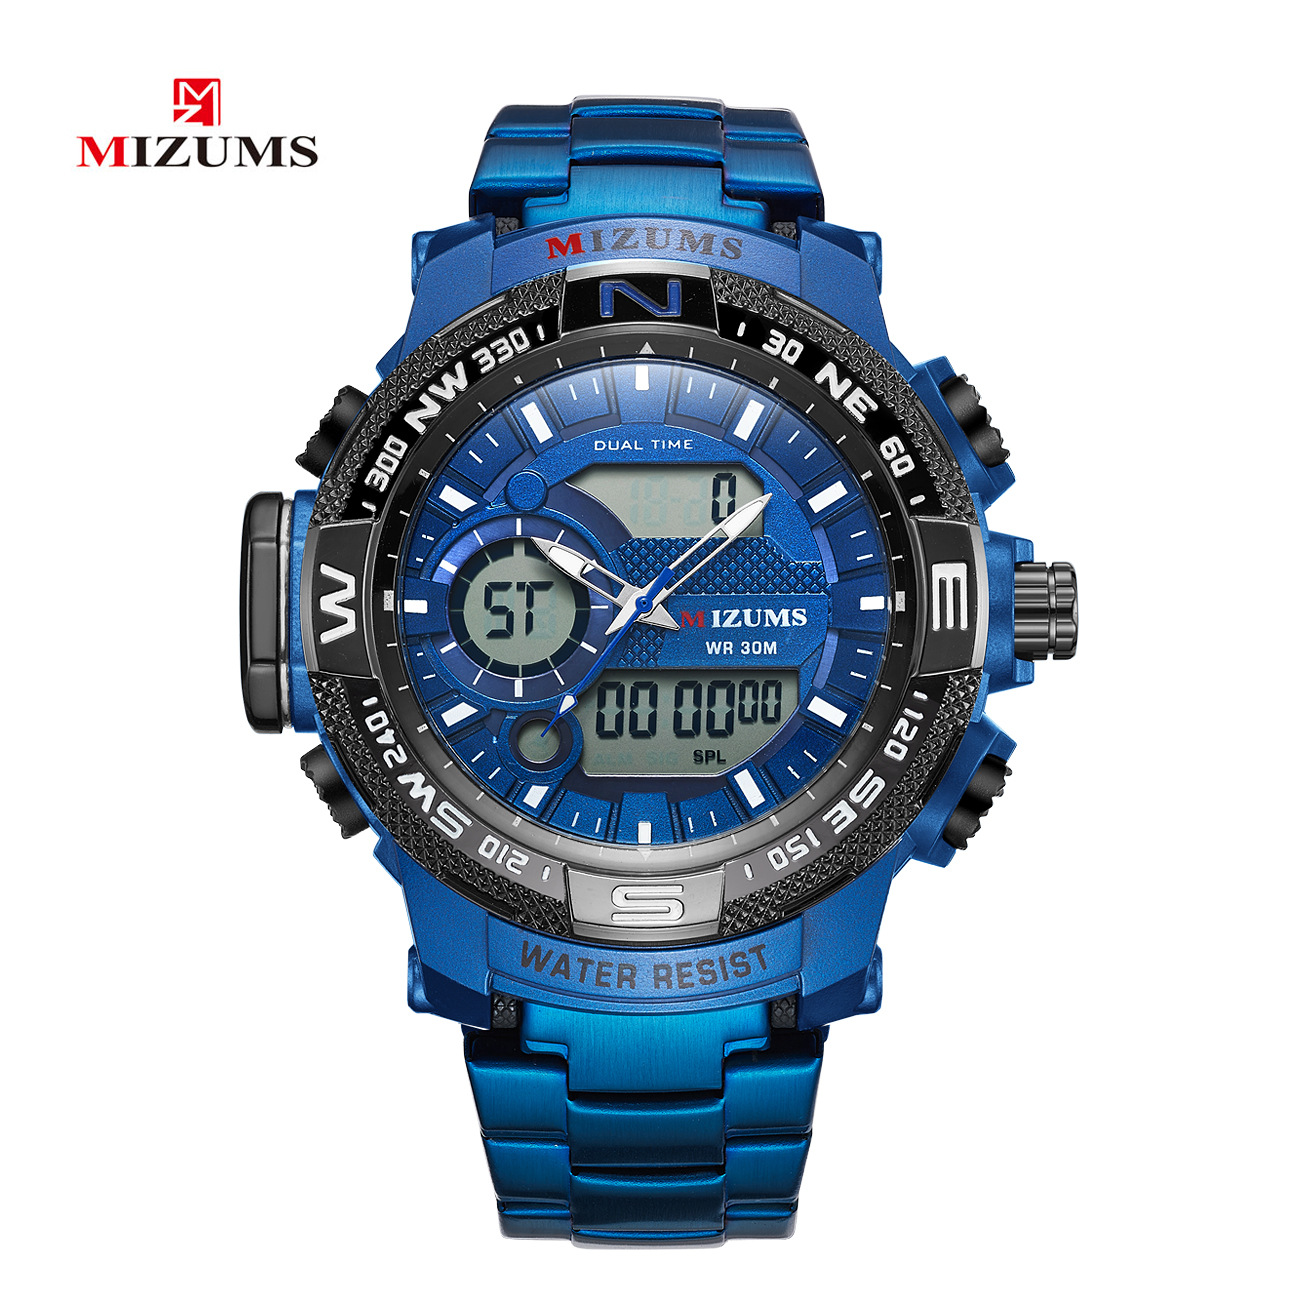 New trend-to-fashion electronic watch dual movement electronic watch steel belt men's watch waterproof quartz sports watch